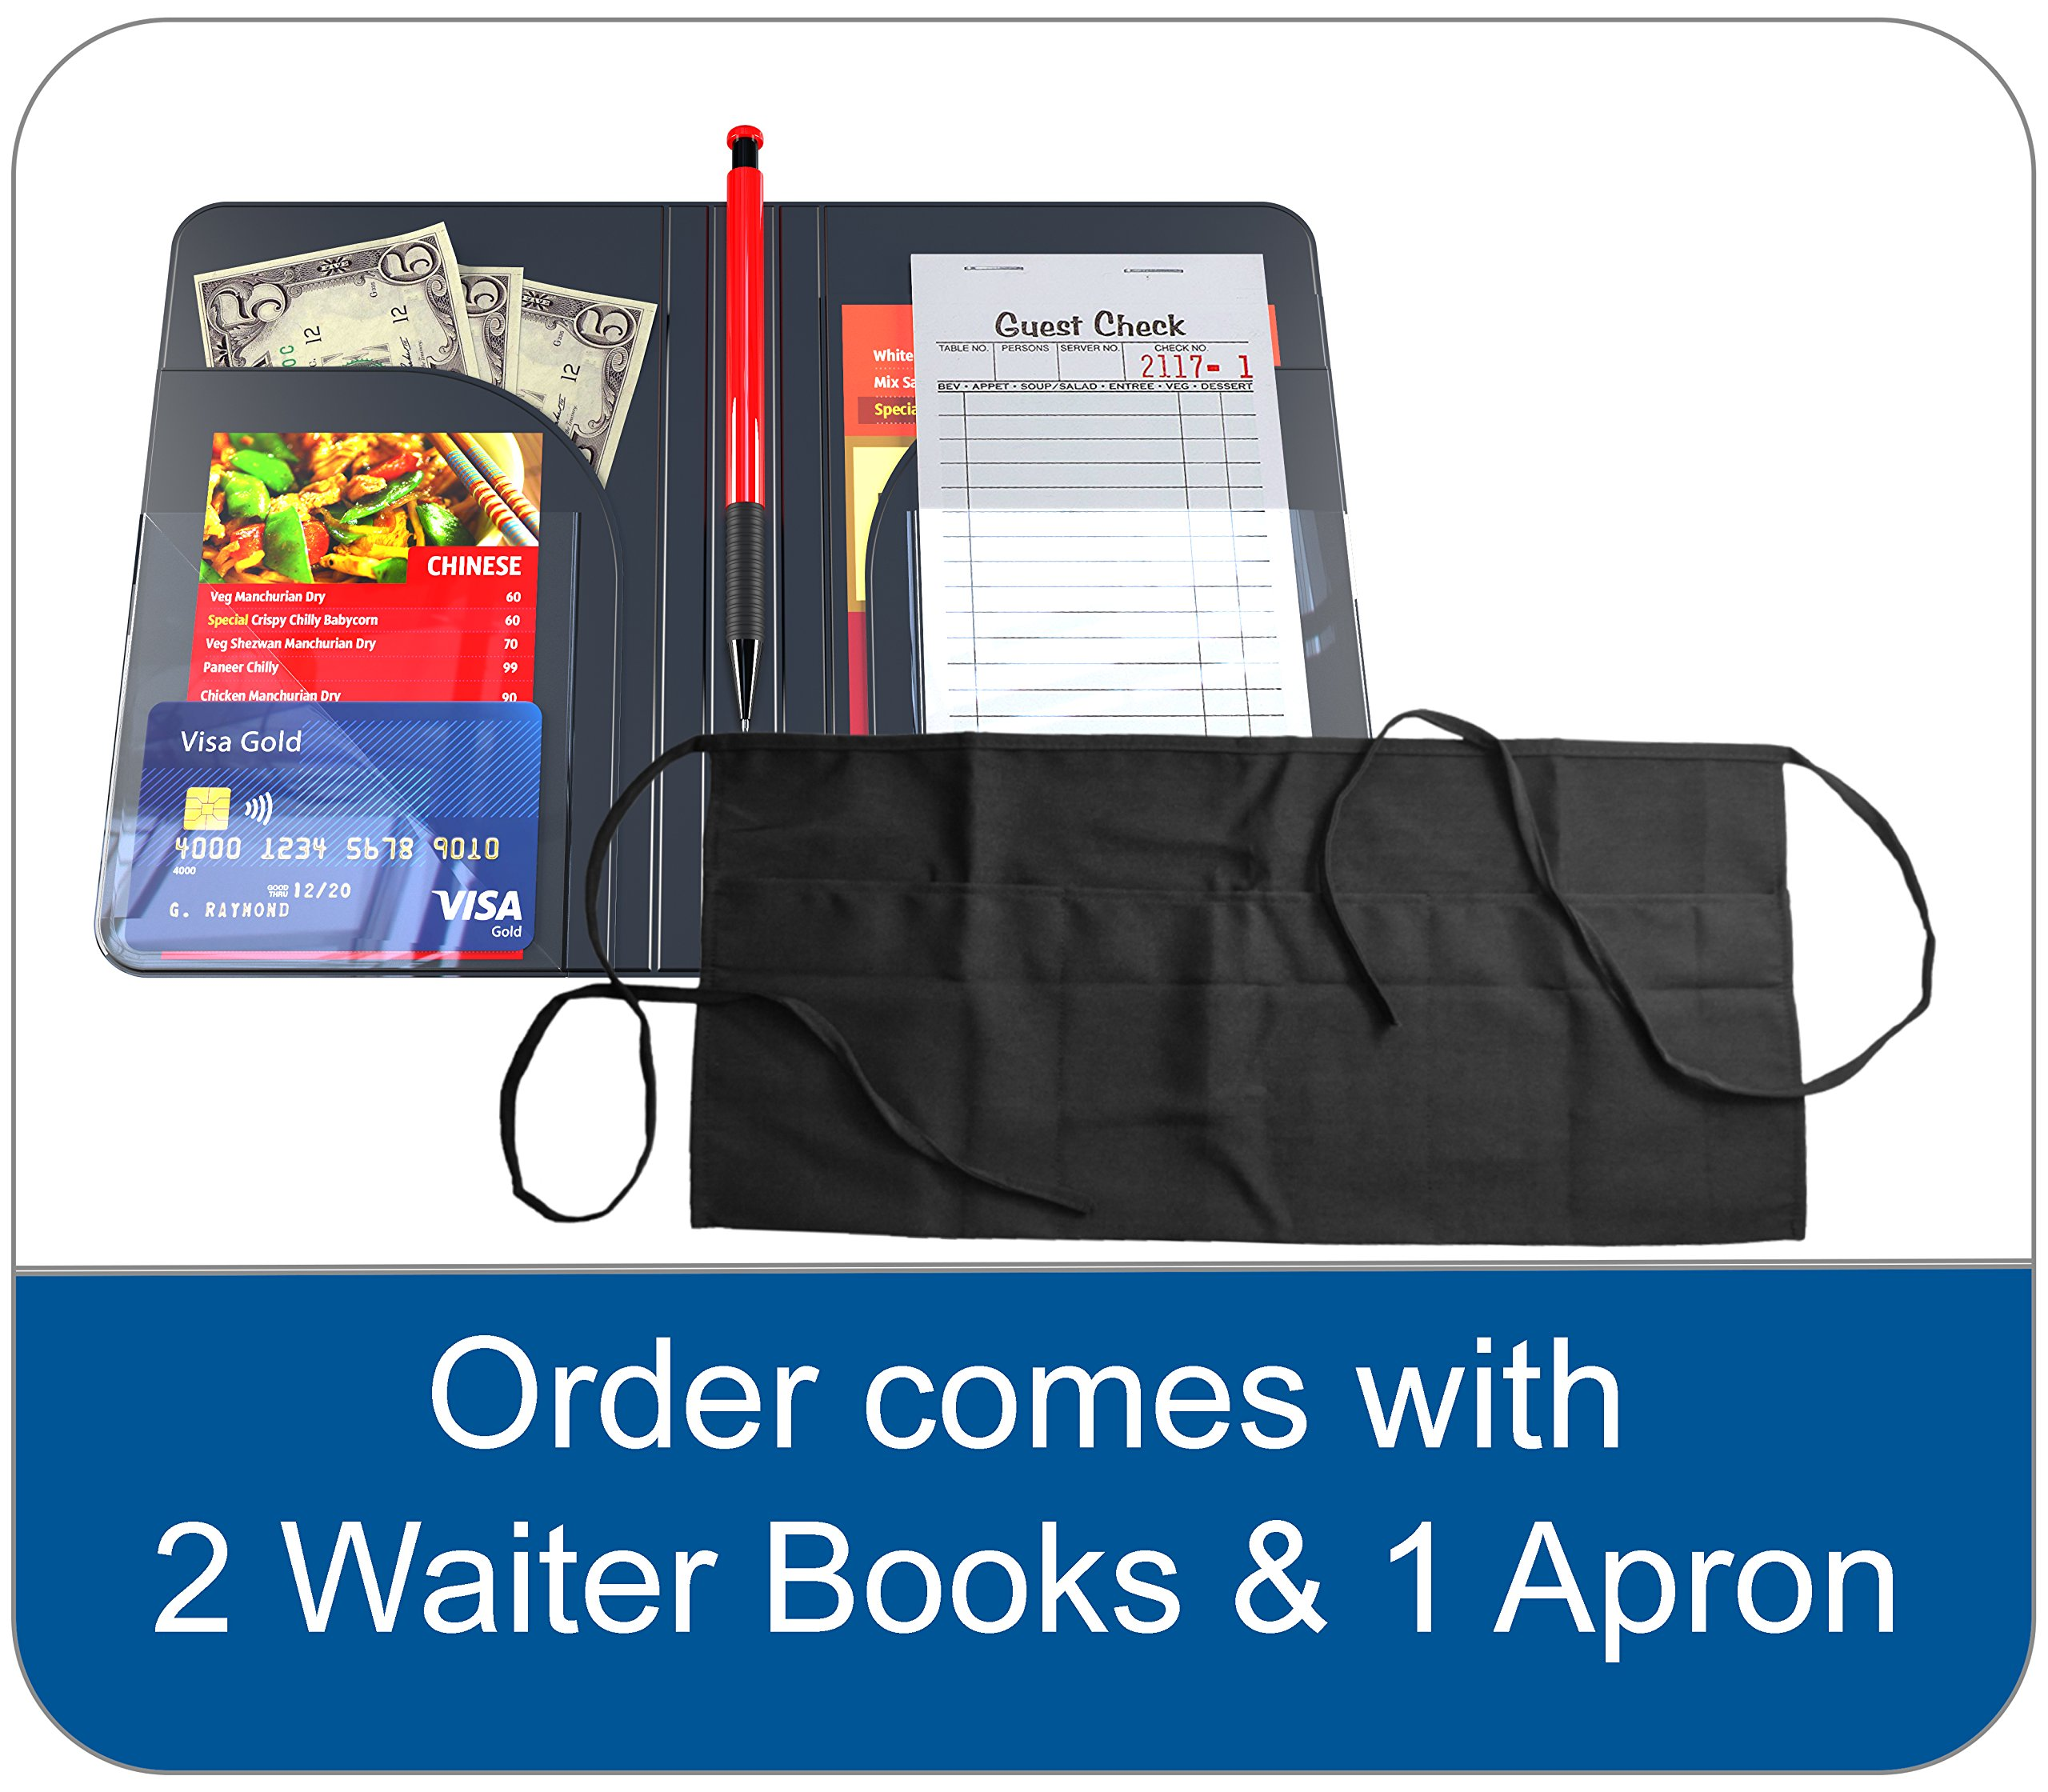 Waiter Book Server Wallet Server Pads Waitress Book Restaurant Waitstaff Organizer, Guest Check Book Holder Money Pocket by Gold Lion Gear (Image #3)